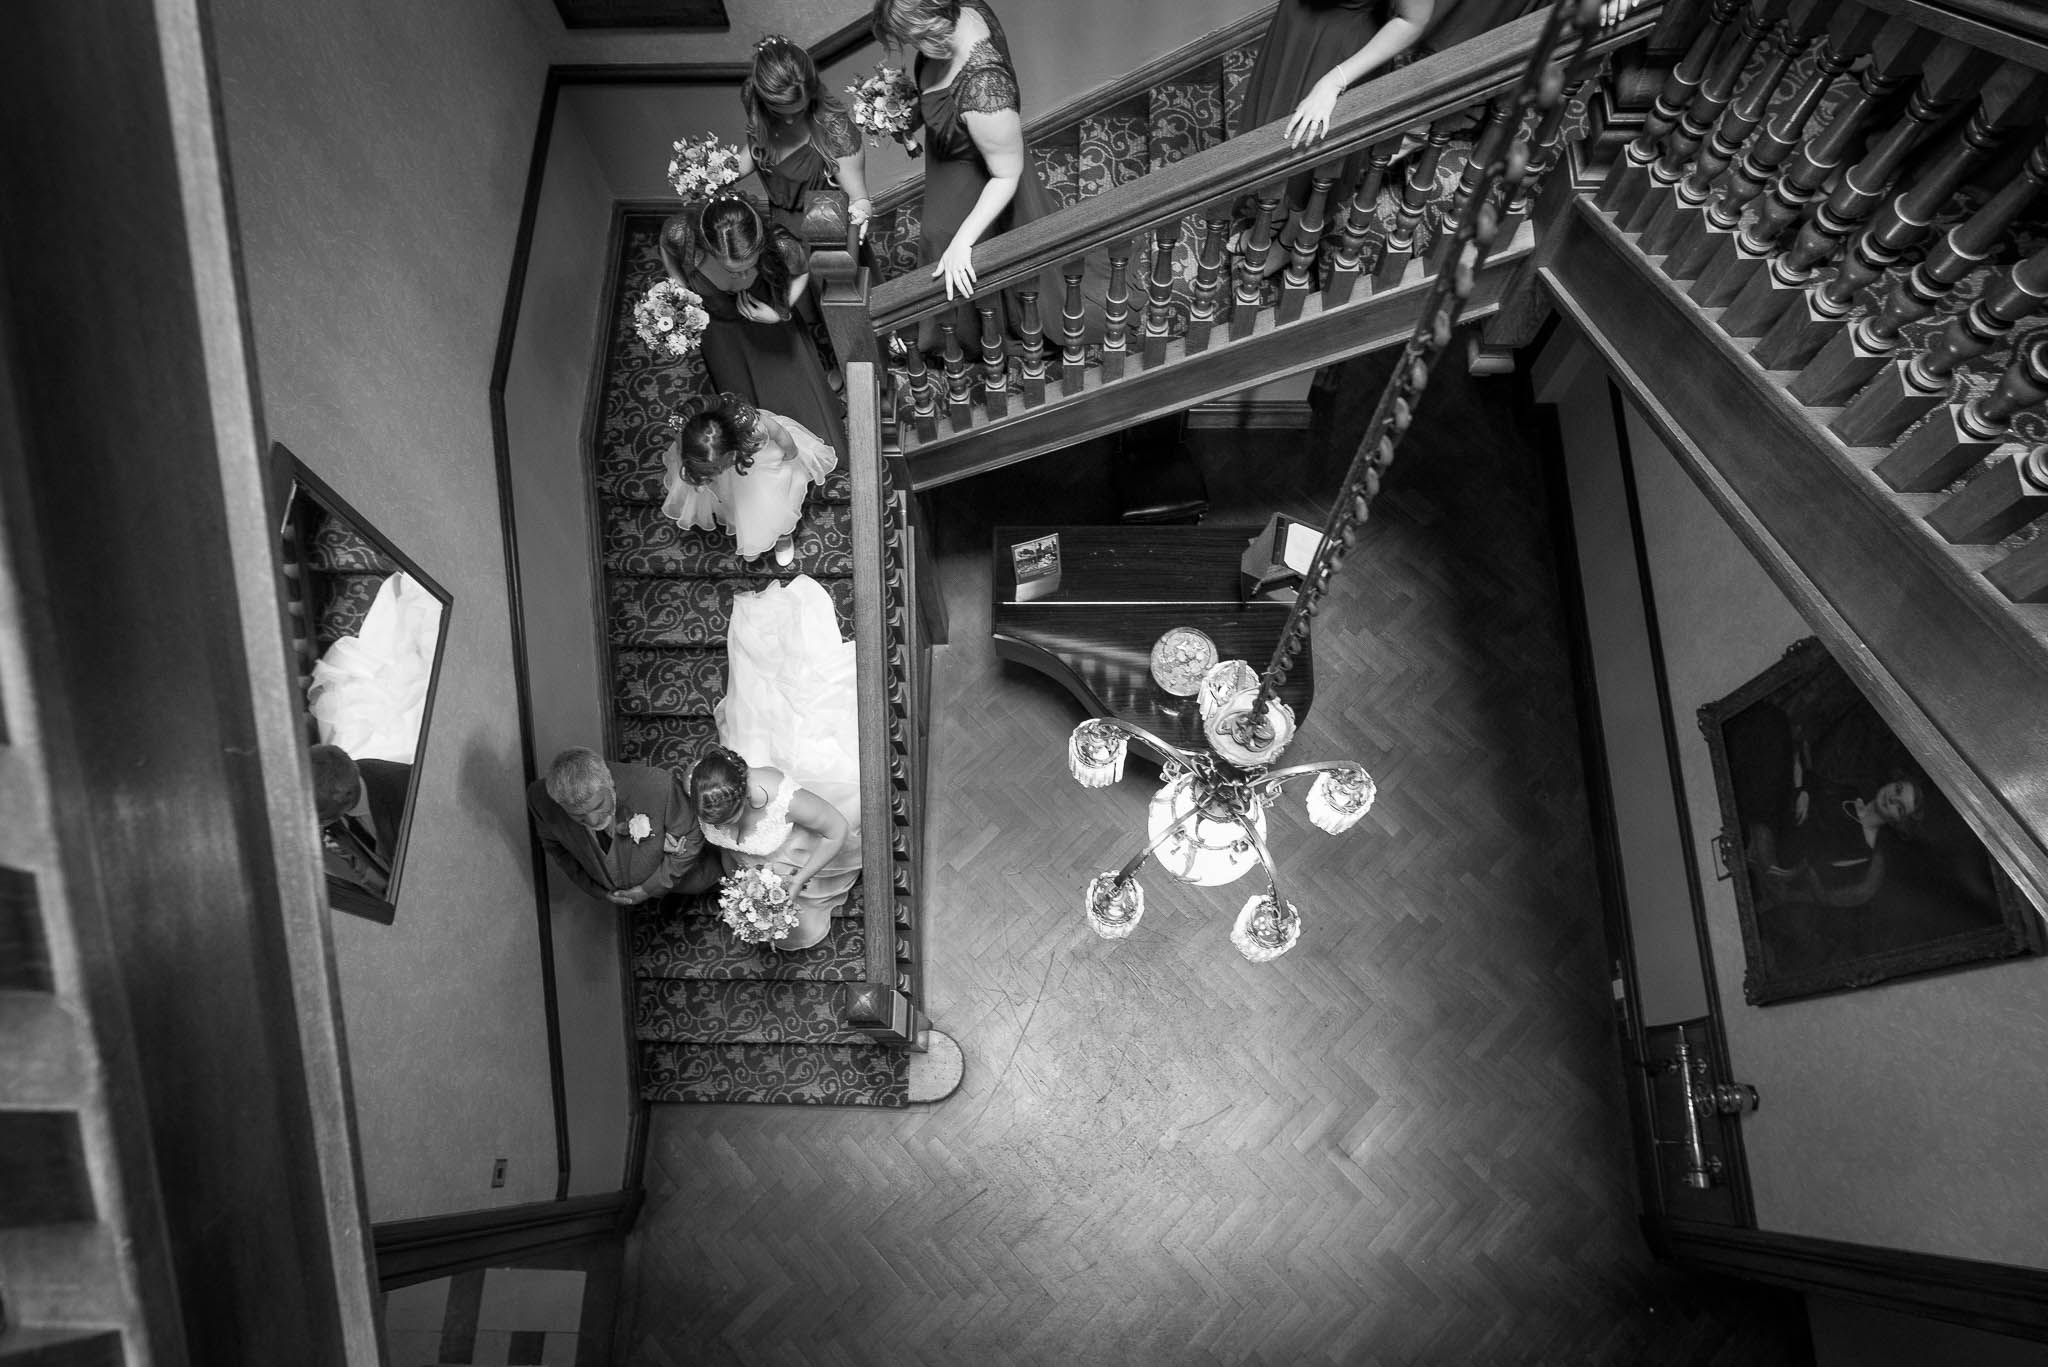 Crathorne Hall Hotel Wedding Photographer47.jpg